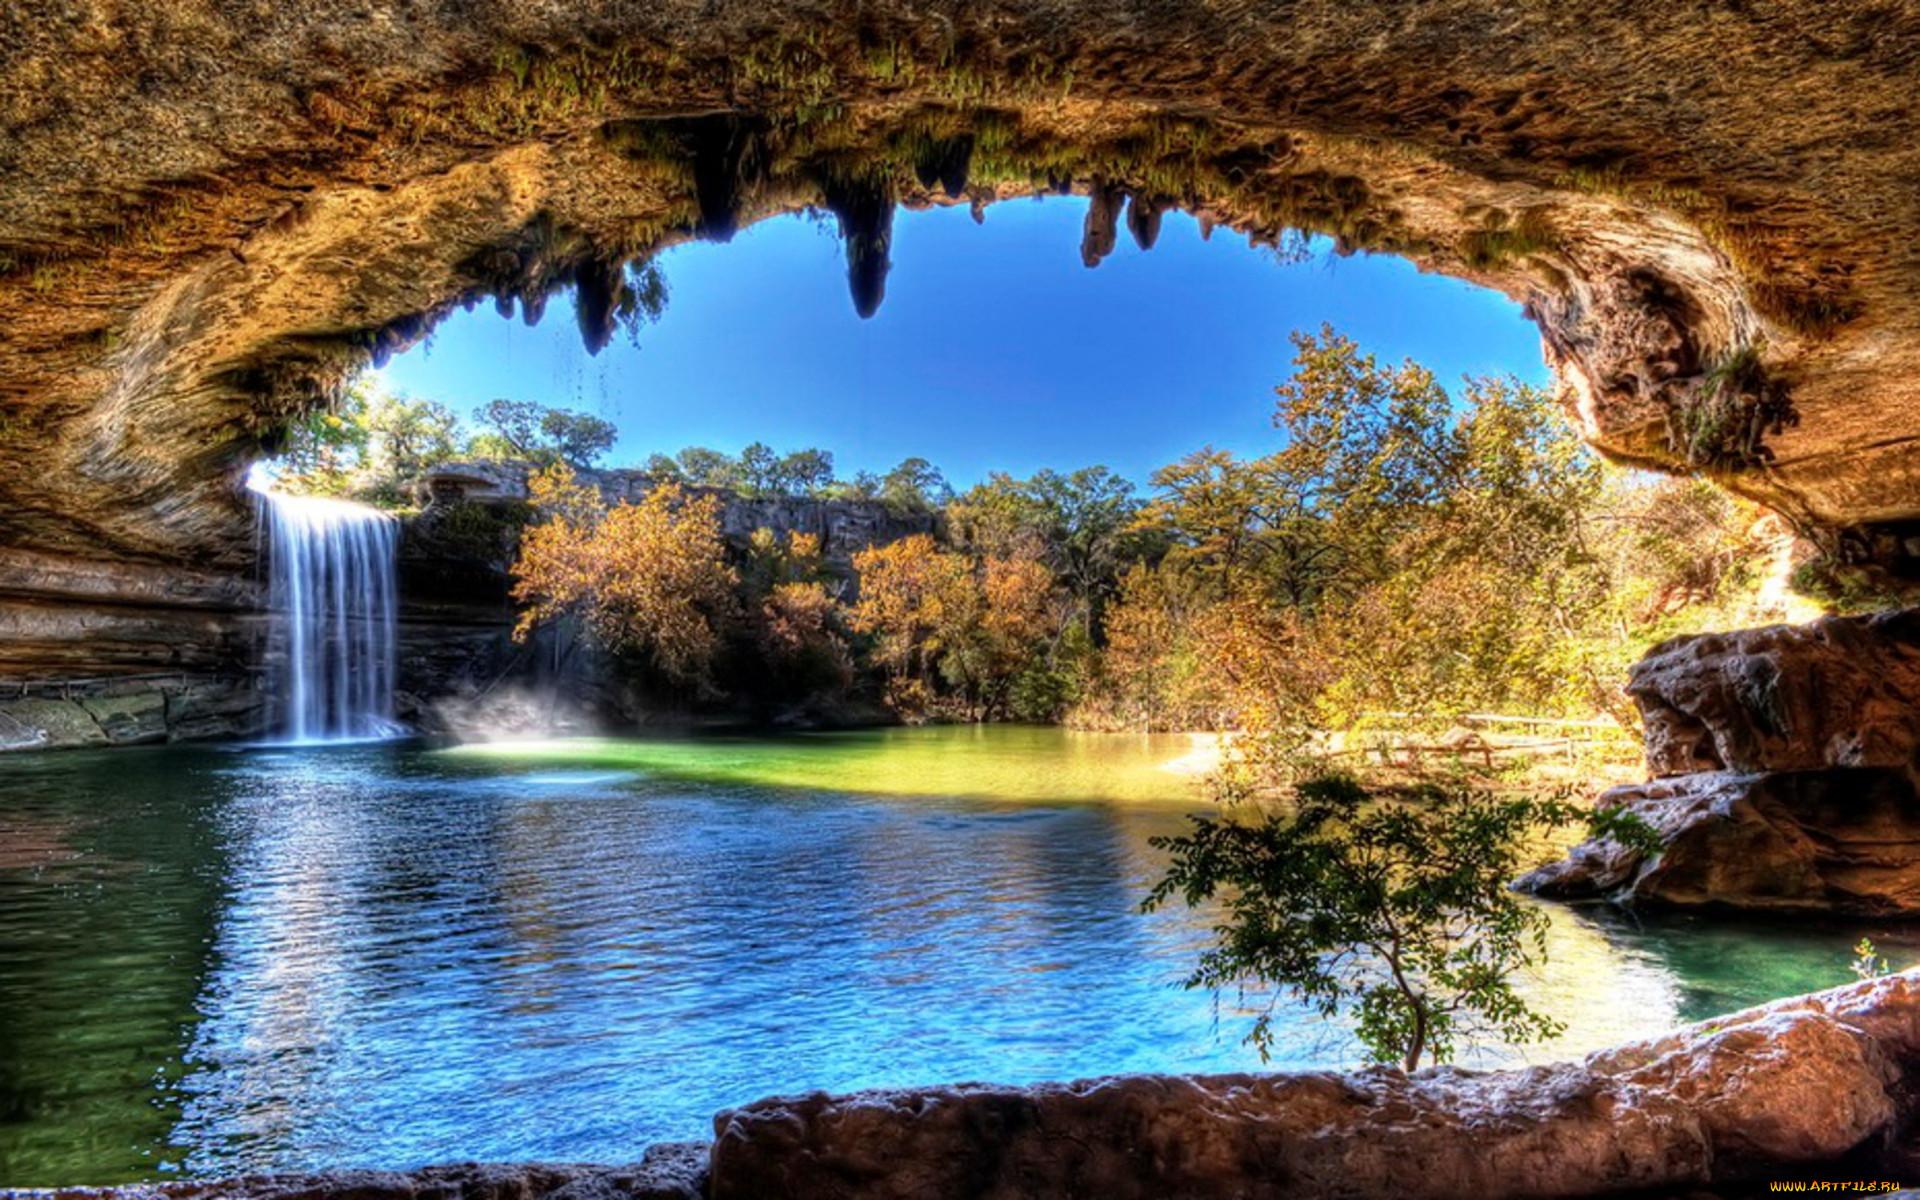 Lake hamilton in texas природа водопады арка